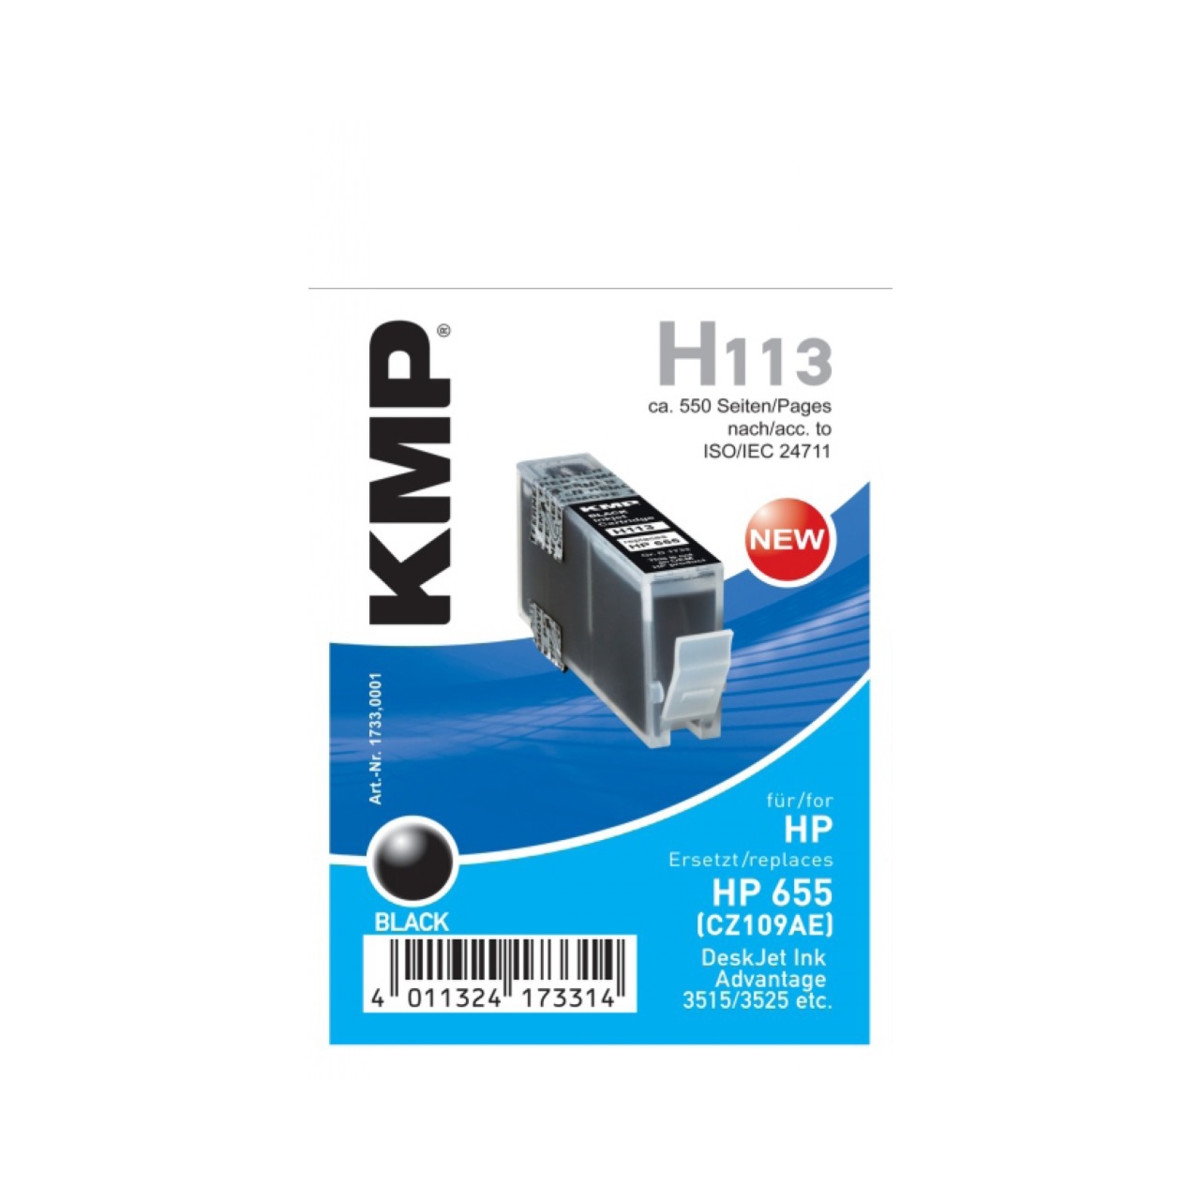 KMP Cartridge HP 655, HP CZ109AE, - kompatibilný s čipom (Čierna)